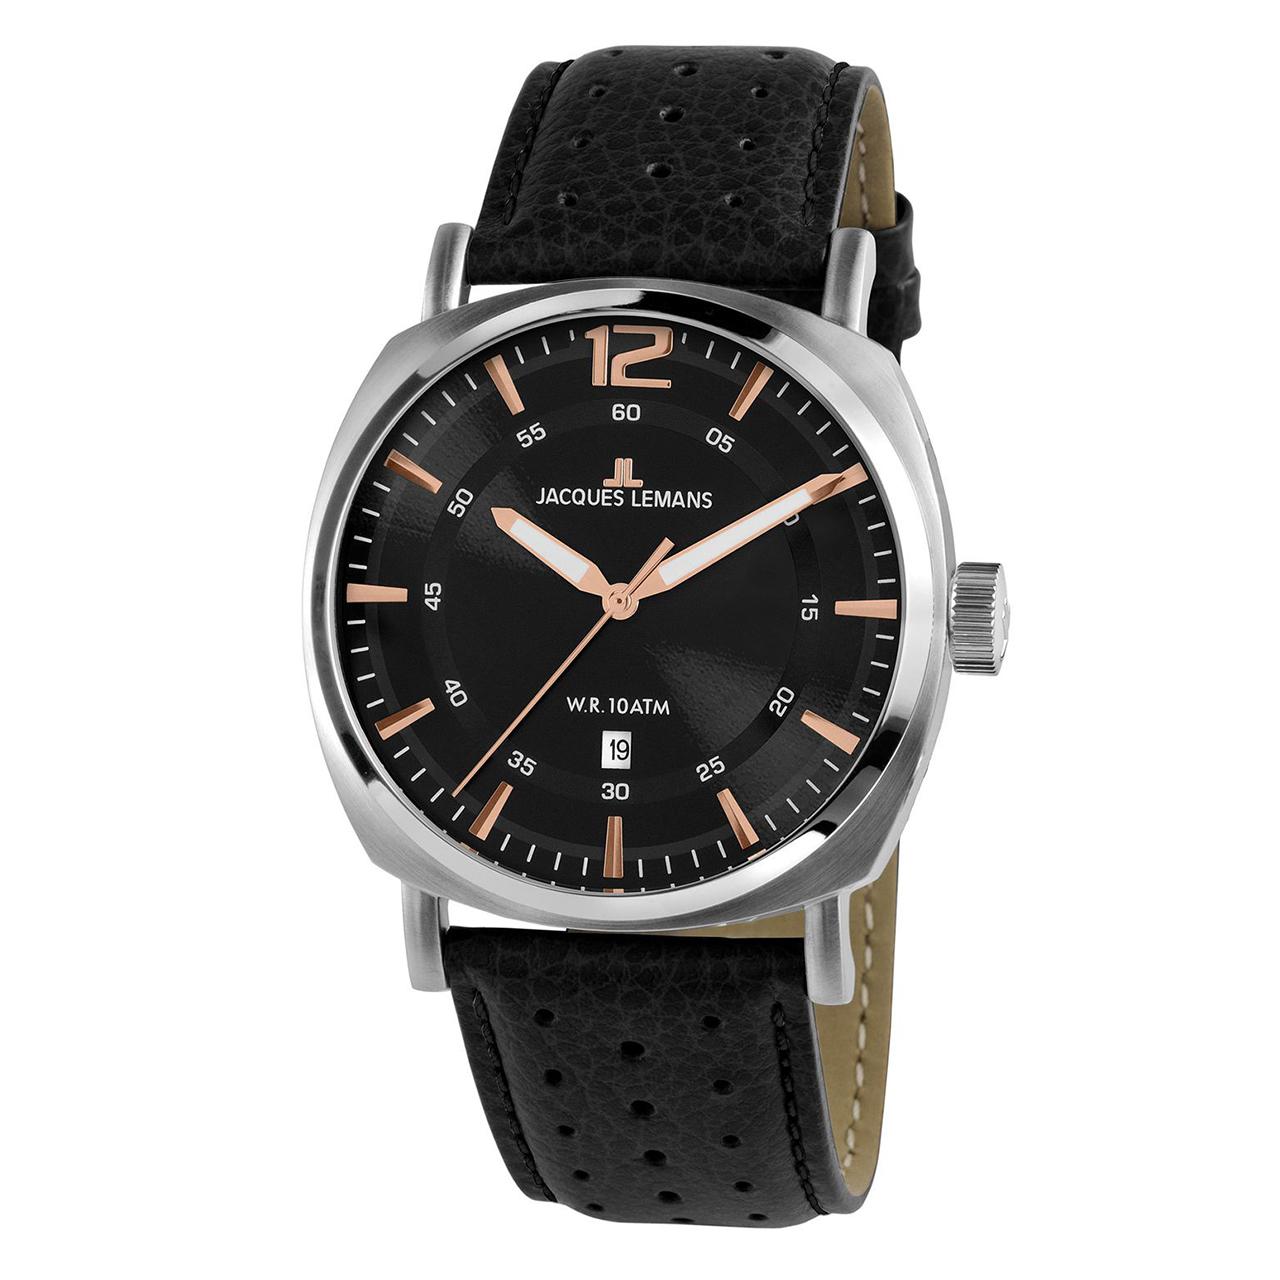 ساعت مچی عقربه ای مردانه ژاک لمن مدل 1-1943A